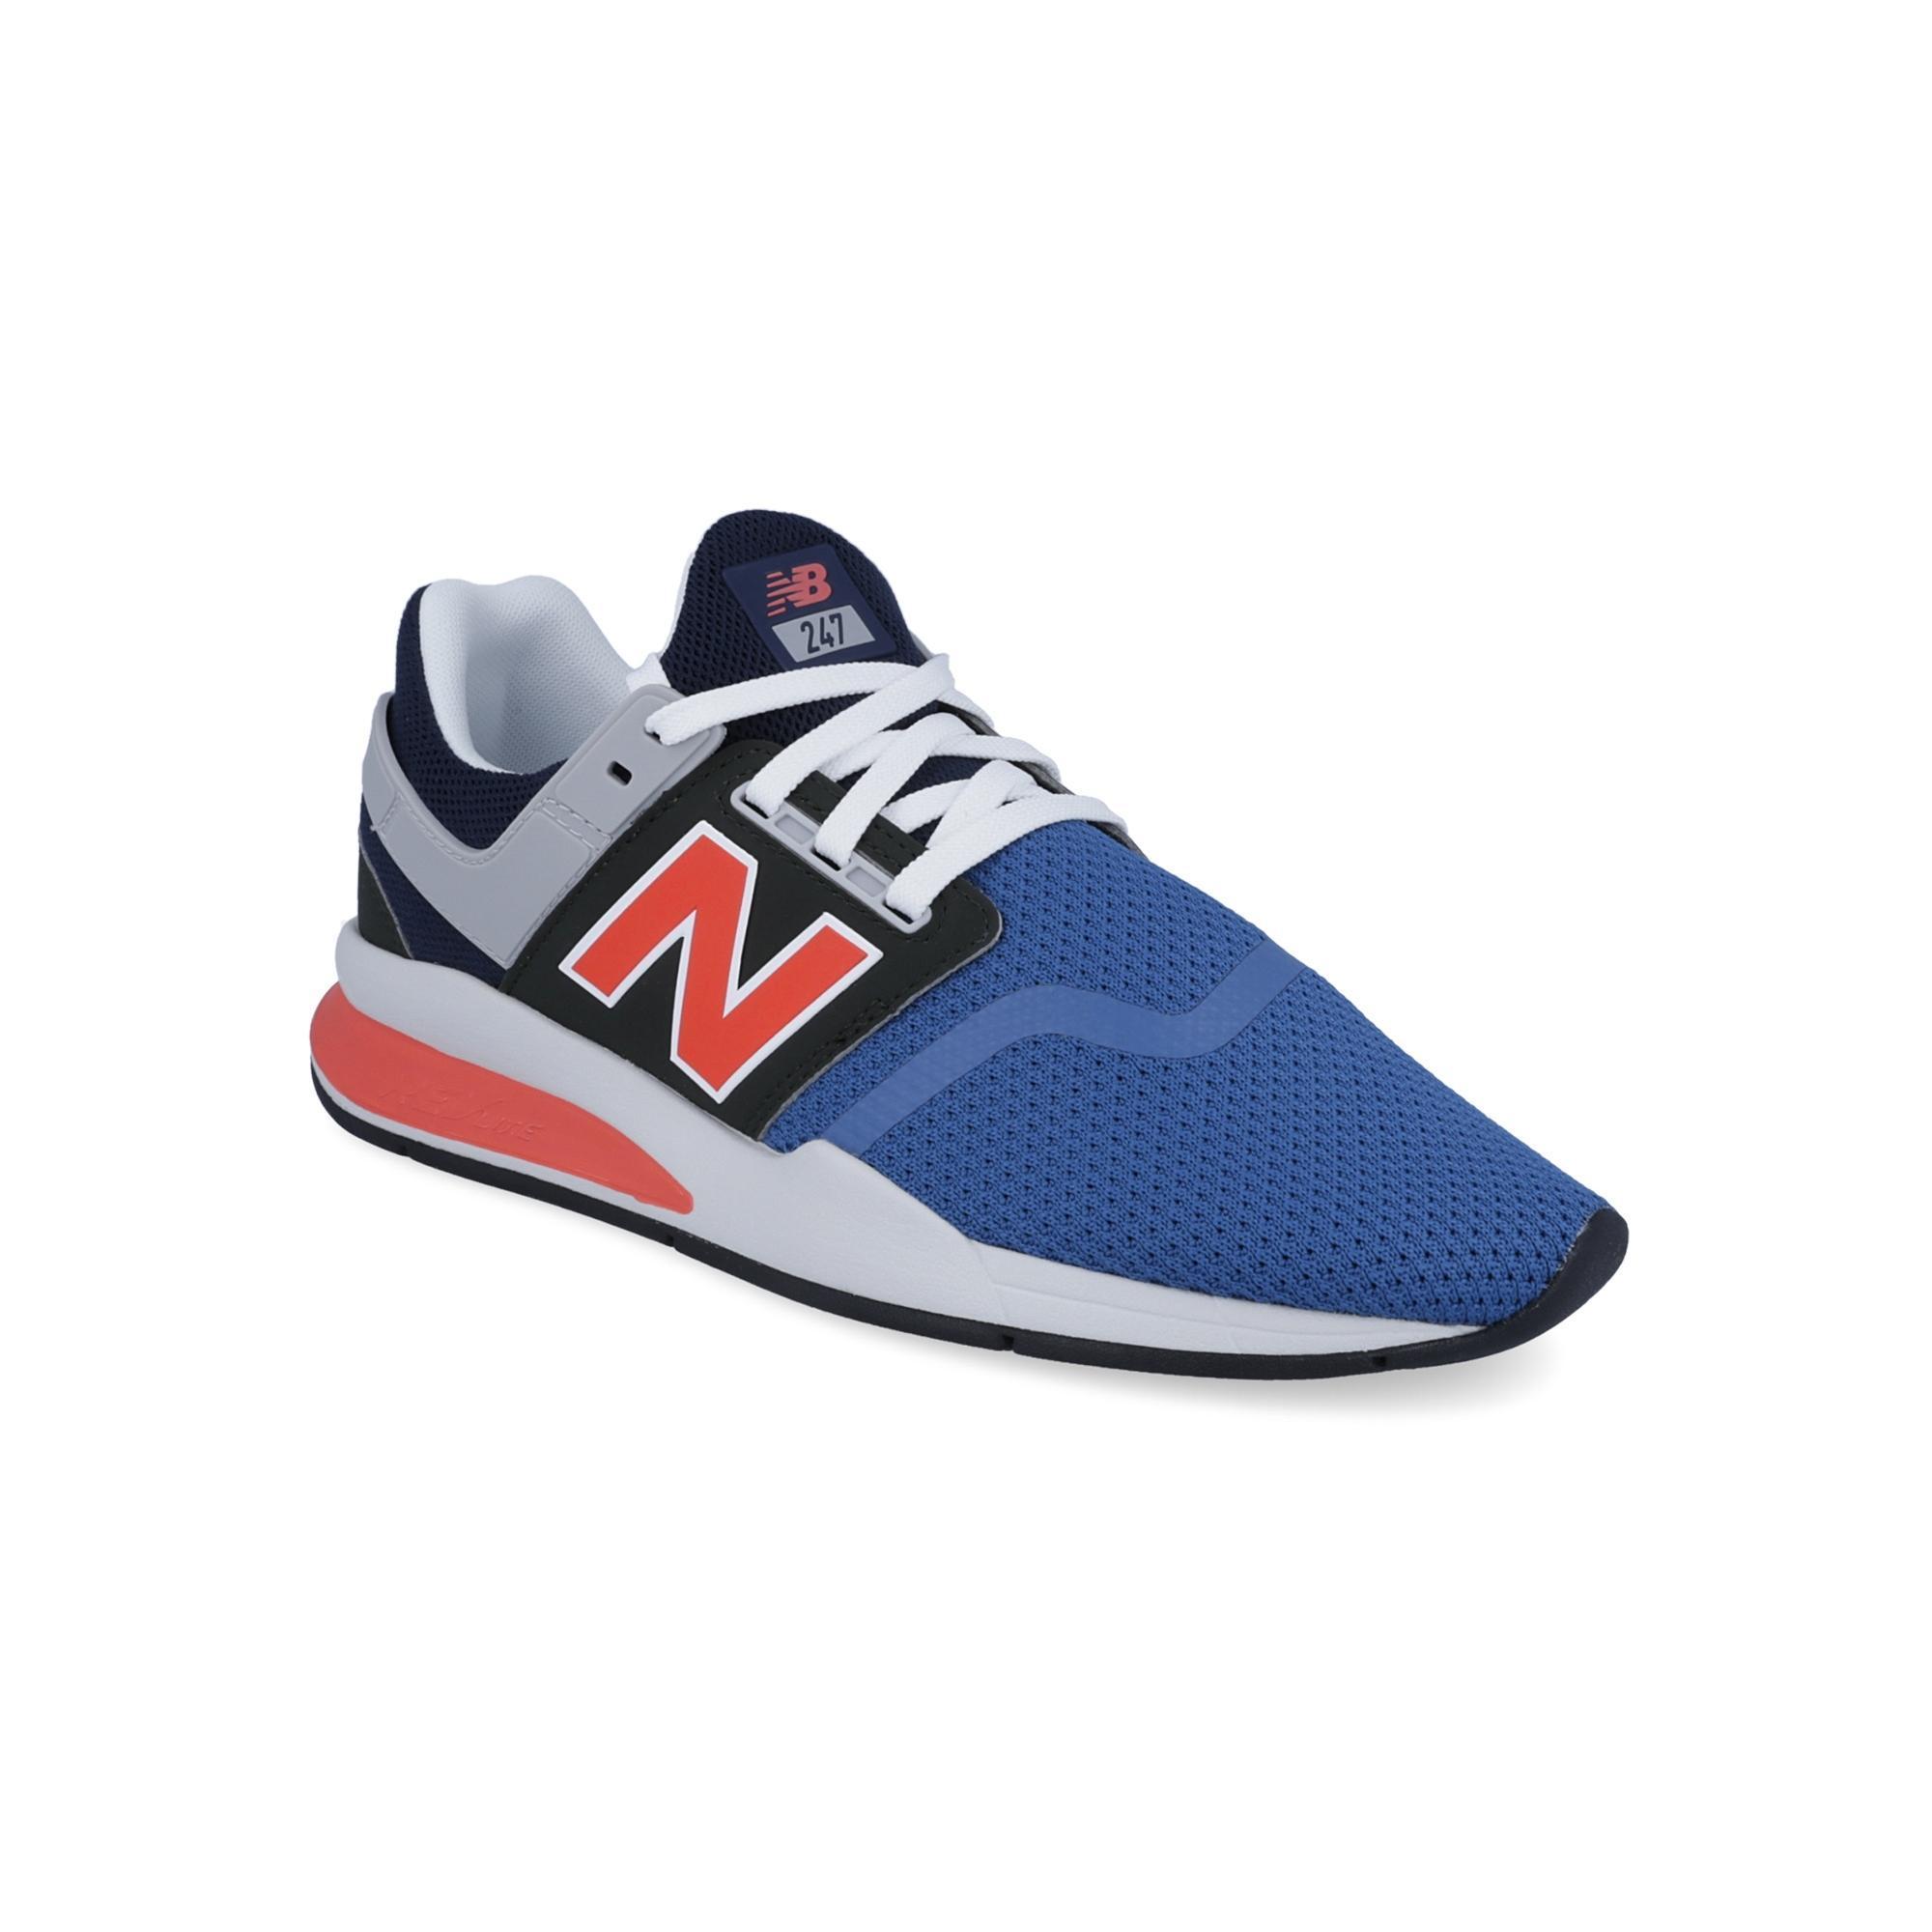 New Balance 247V2 J Crew Sepatu Olahraga Pria - Biru